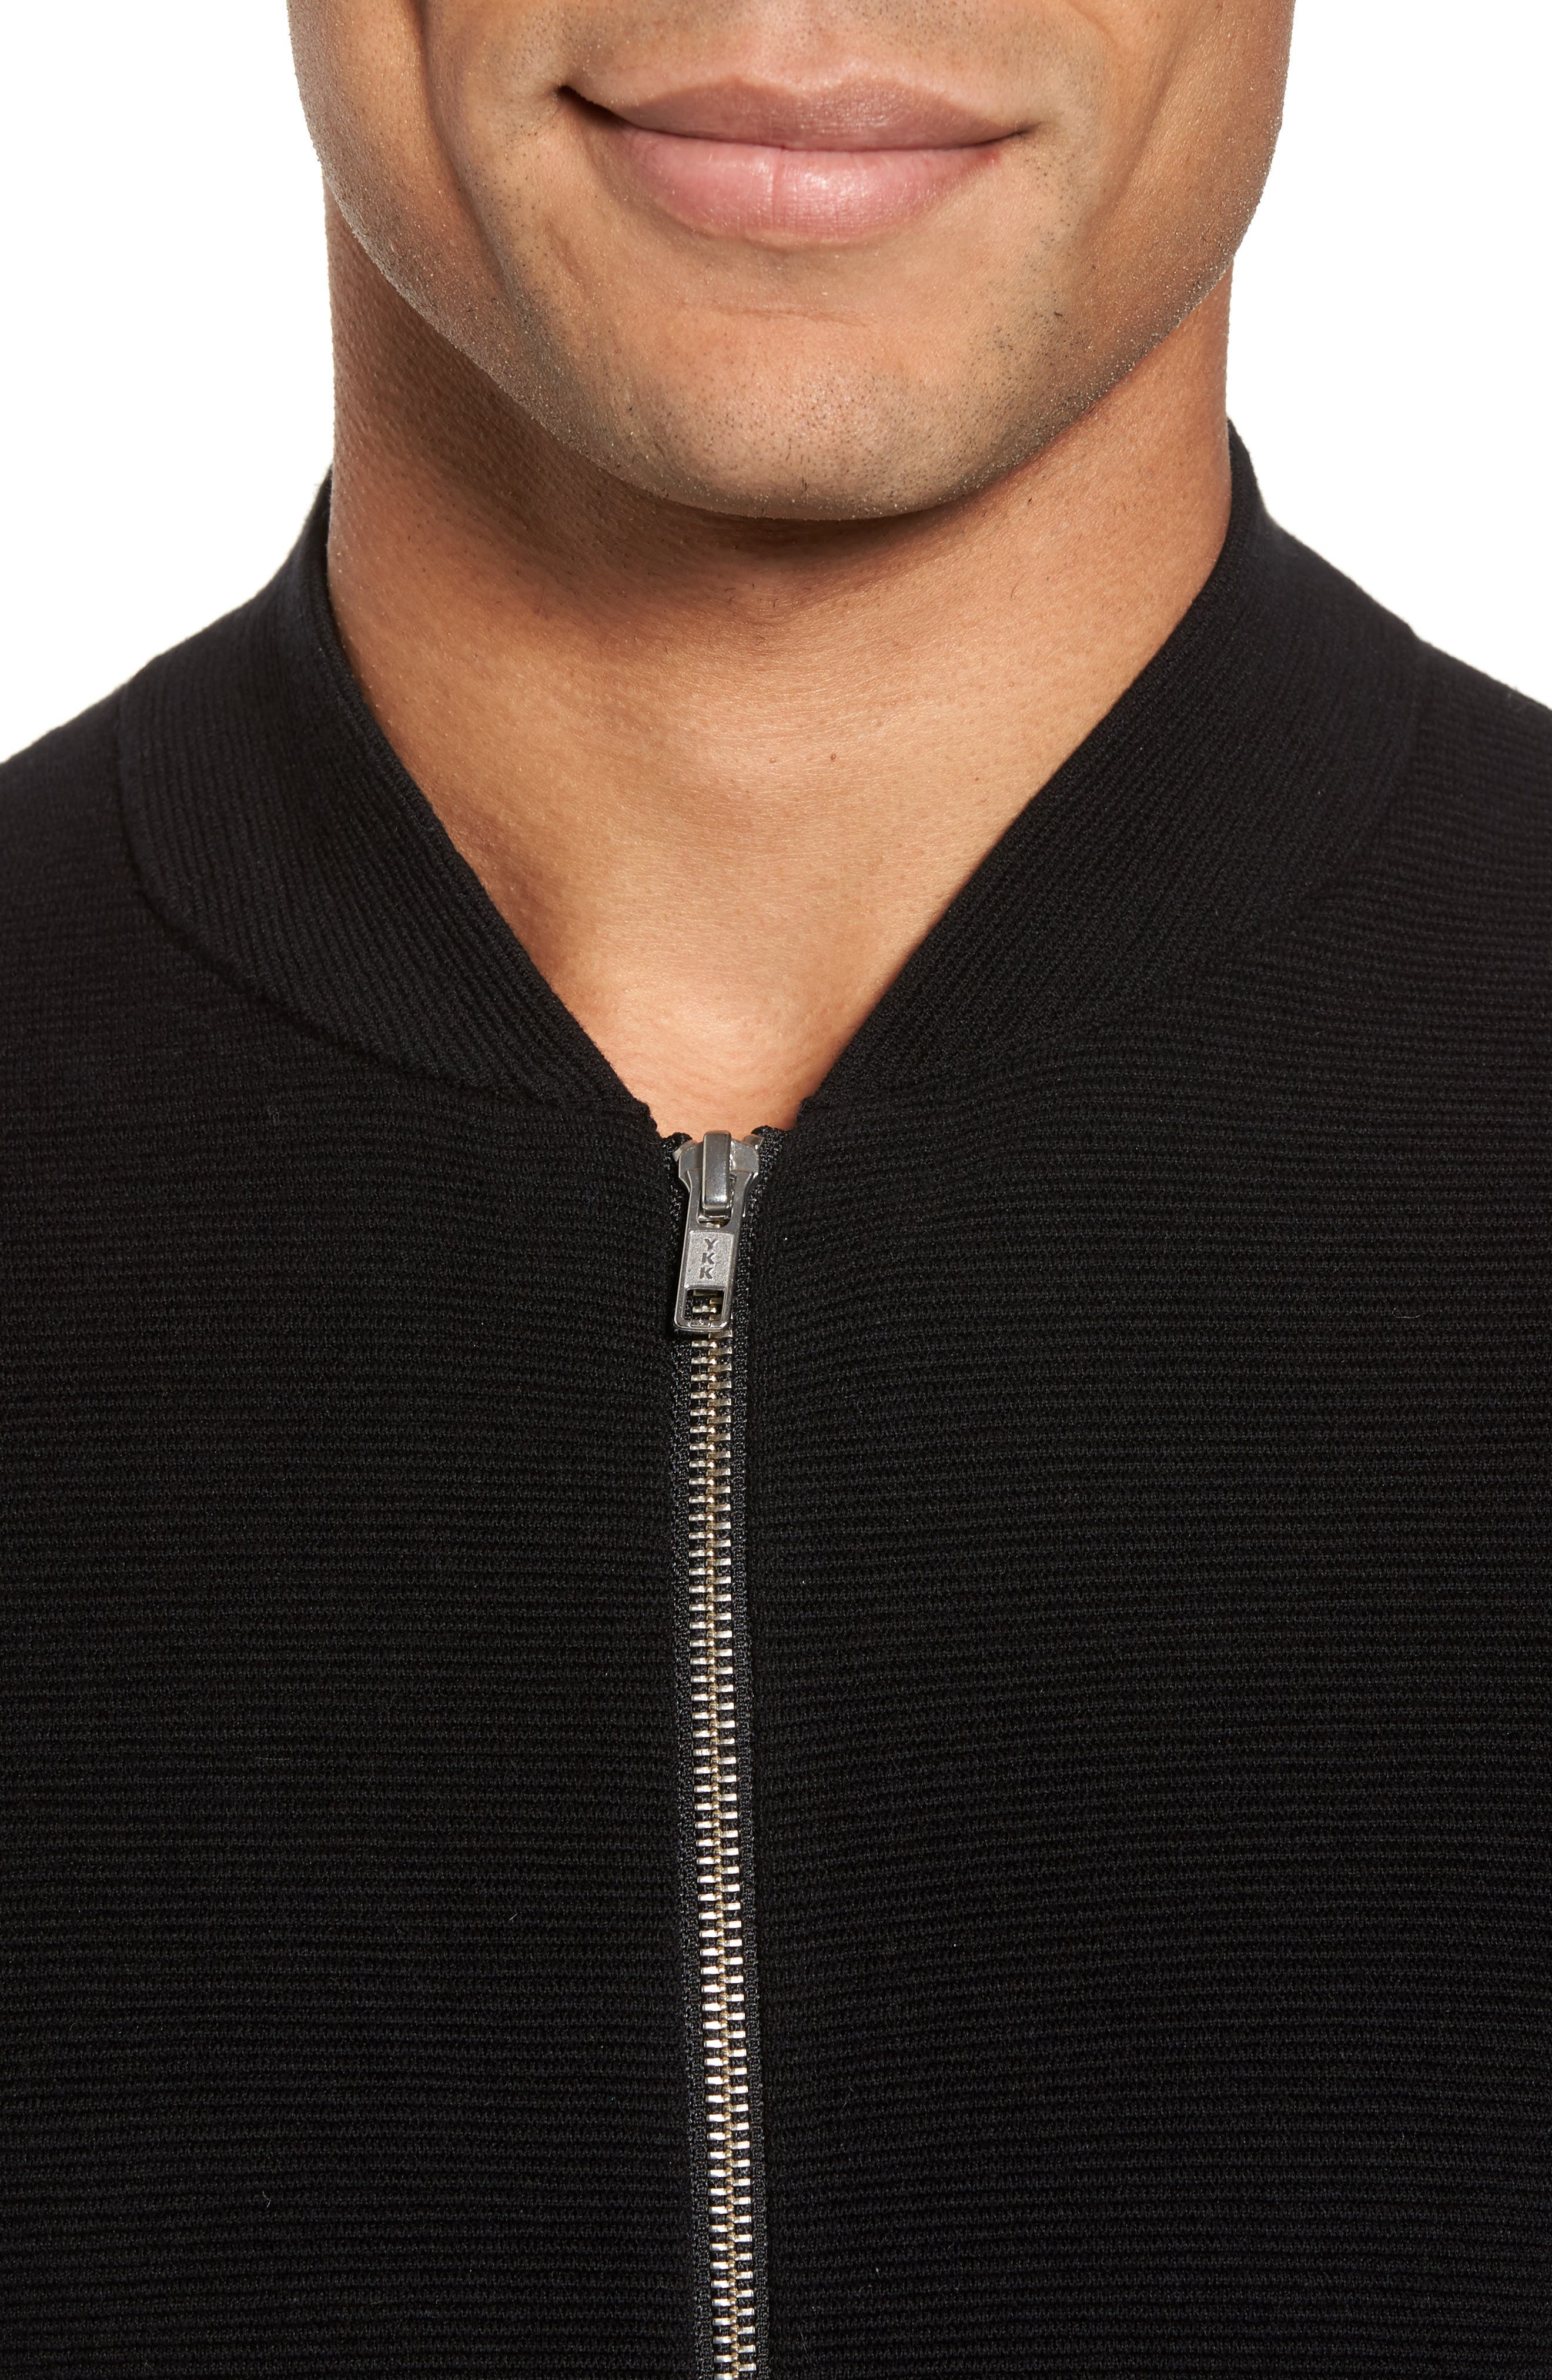 Ottoman Zip Cardigan,                             Alternate thumbnail 4, color,                             Black